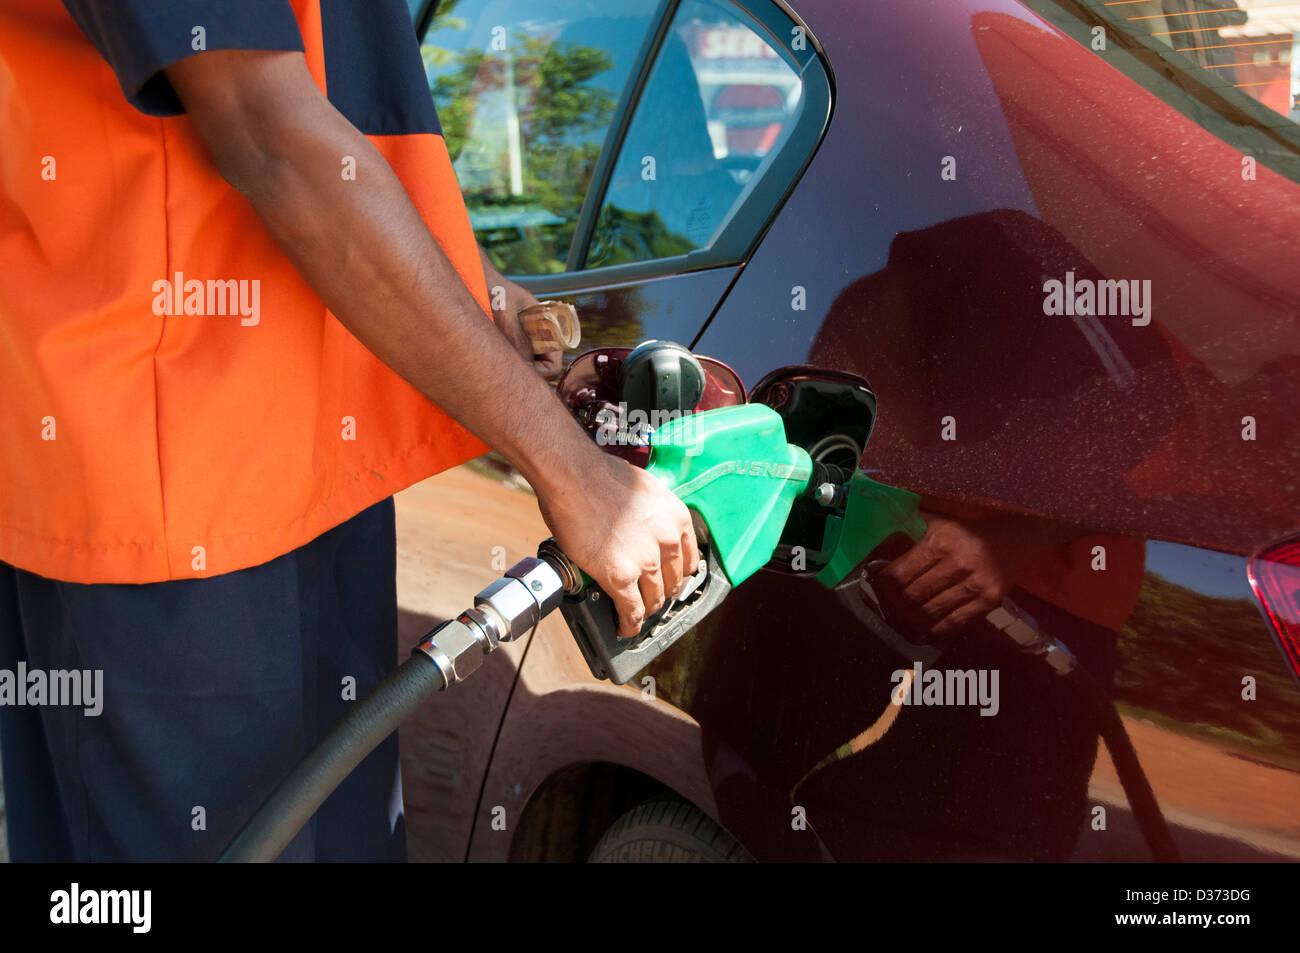 Filing a car with petrol in kerala, India - Stock Image